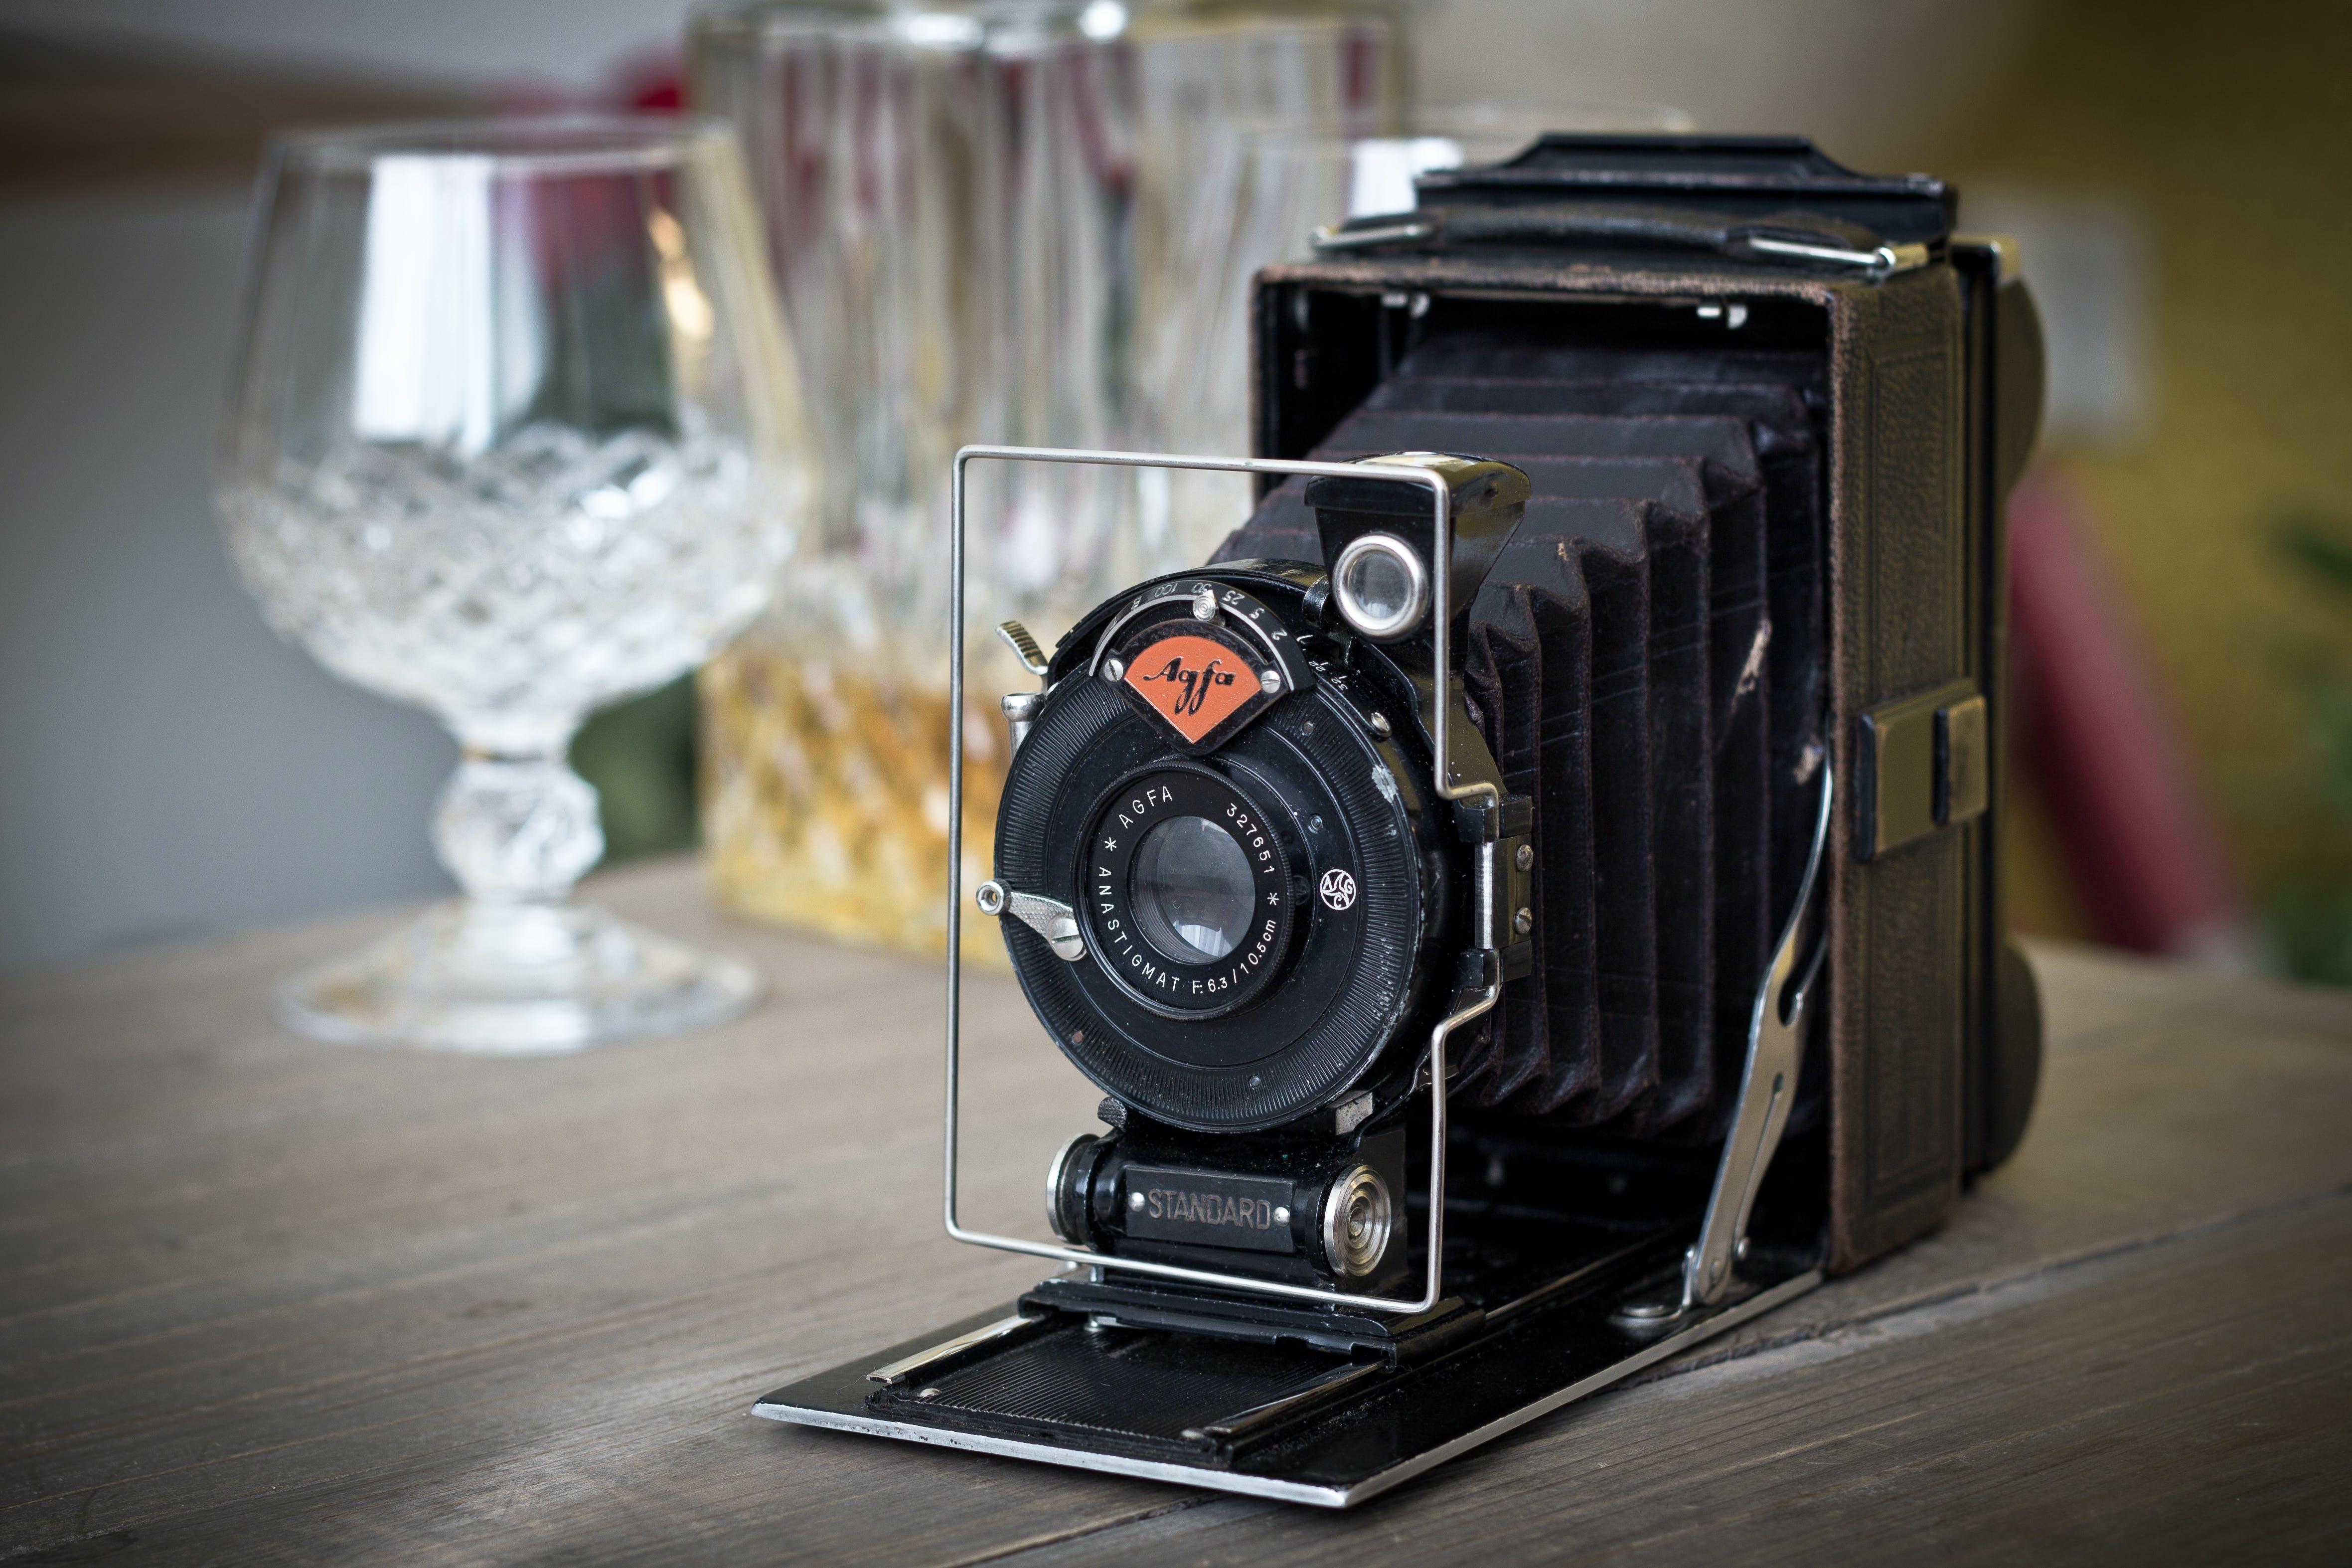 Free stock photo of camera, vintage, agfa, vintage camera